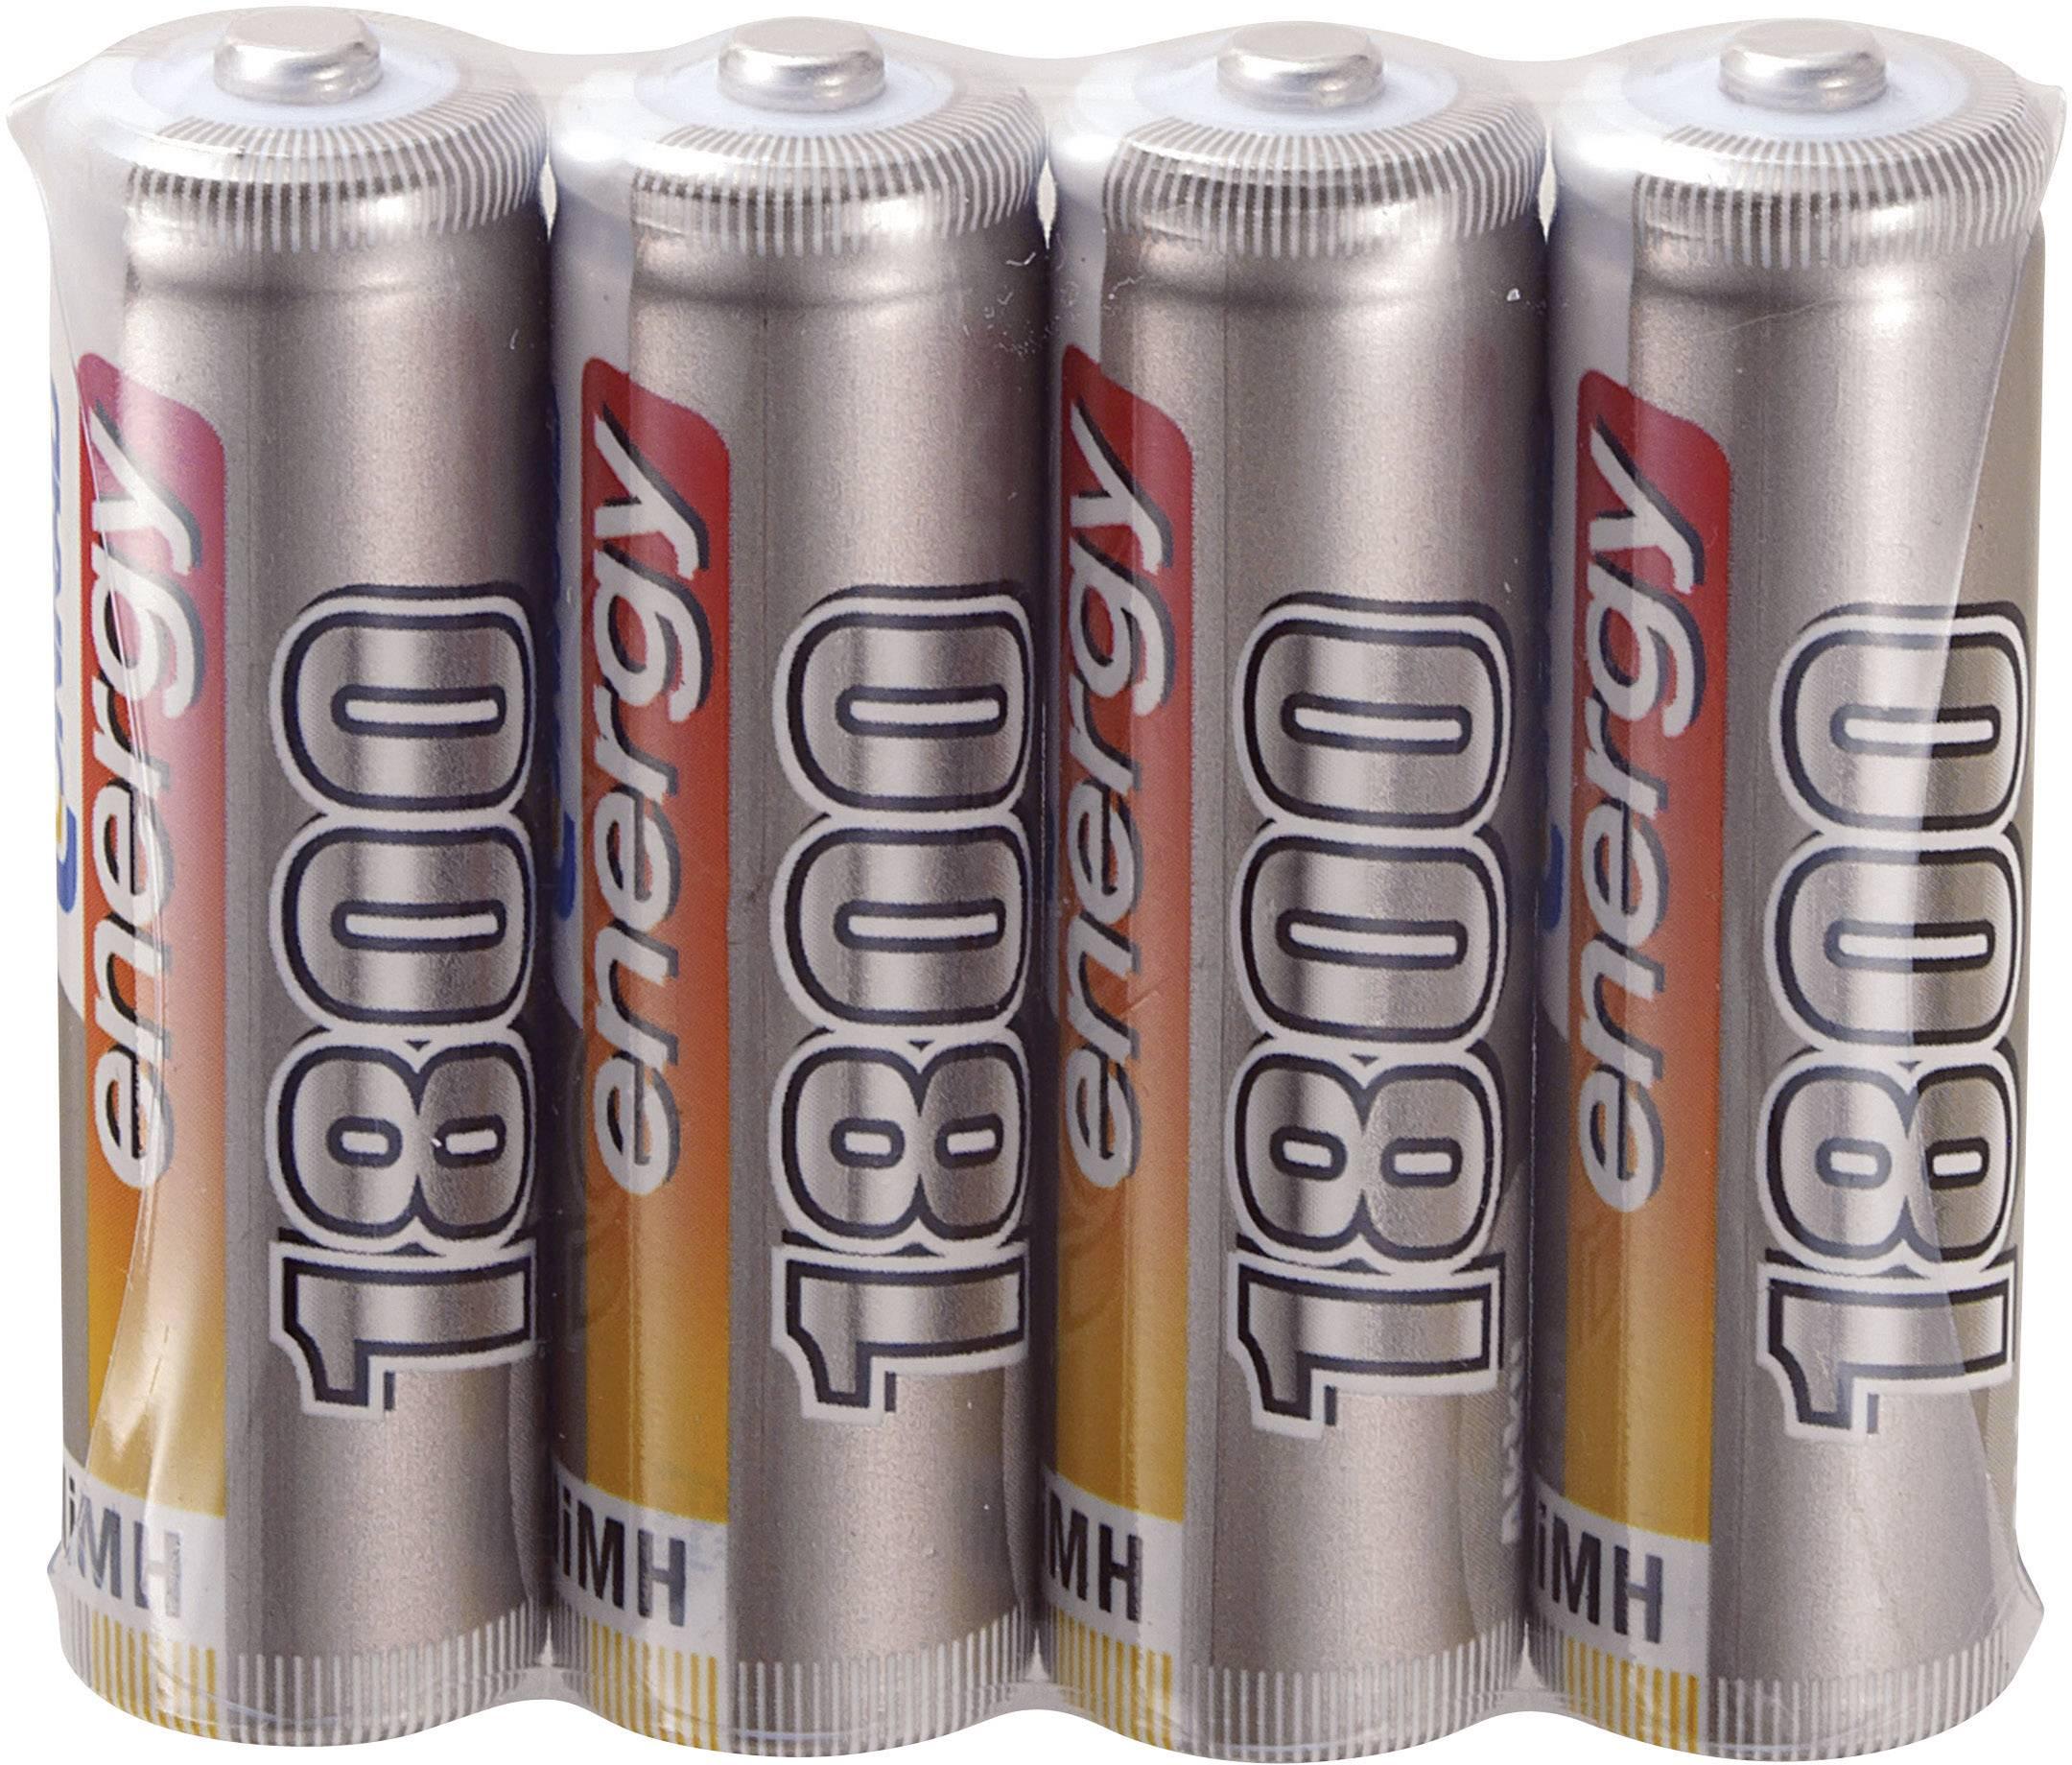 Slot pre akumulátor mignon (AA) 1.2 V, 1800 mAh, Conrad energy 206636